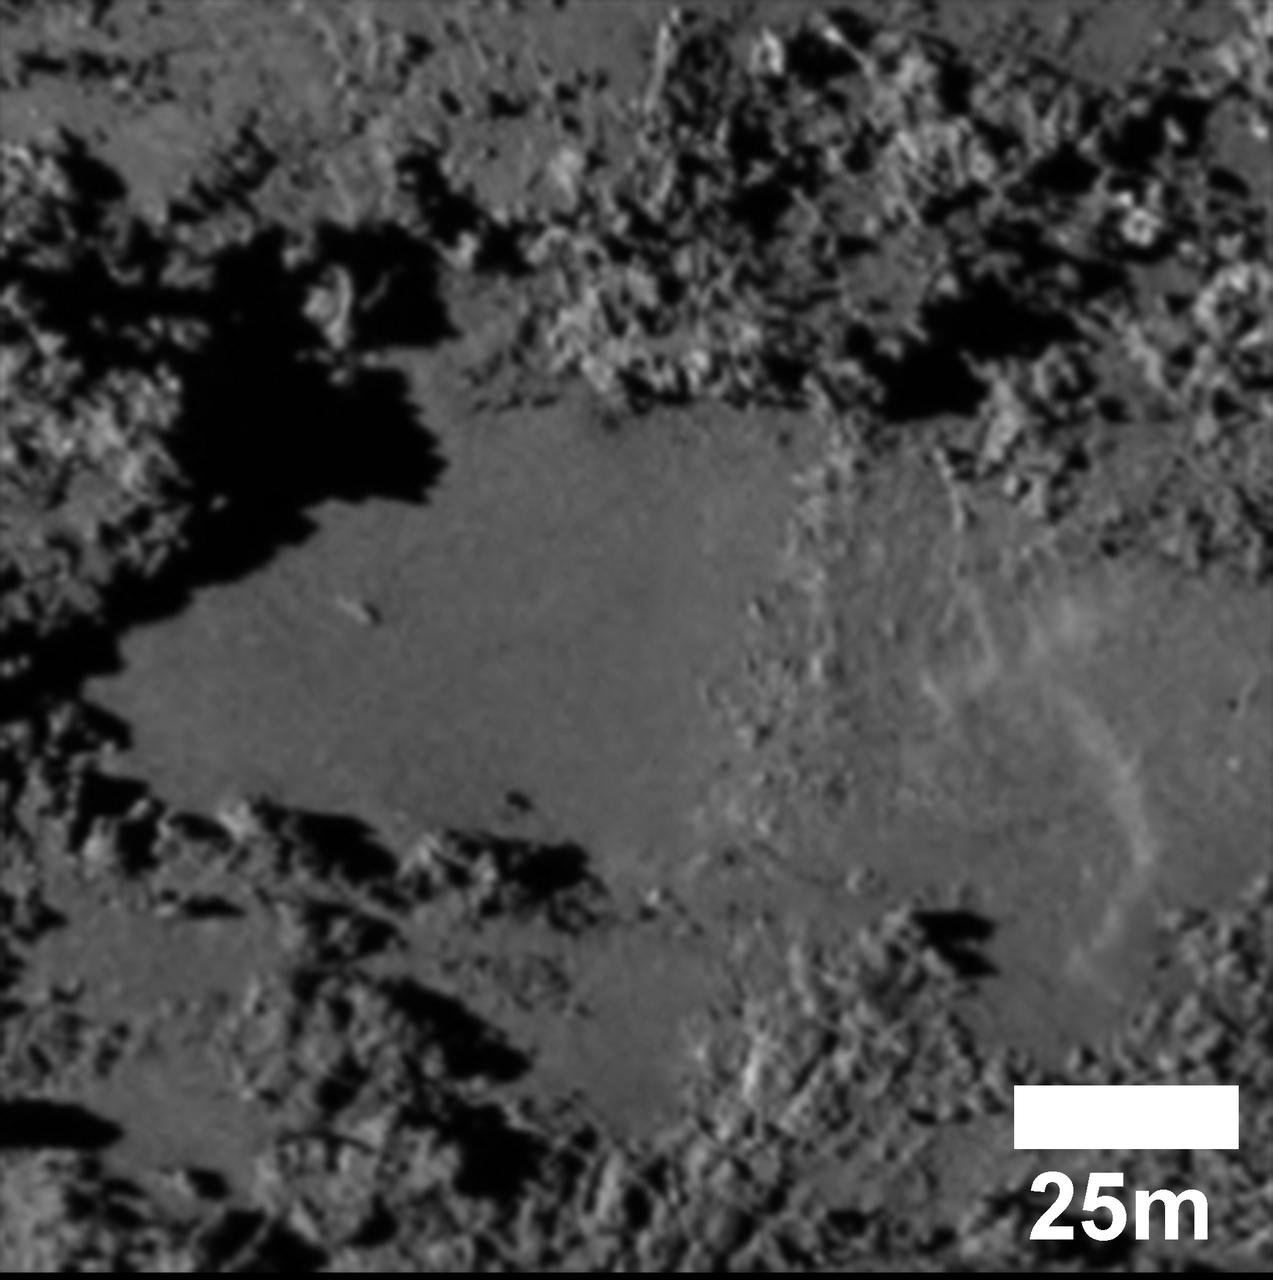 1567215979097-ESA_Rosetta_OSIRIS_Khepry_zoom_1280.jpg